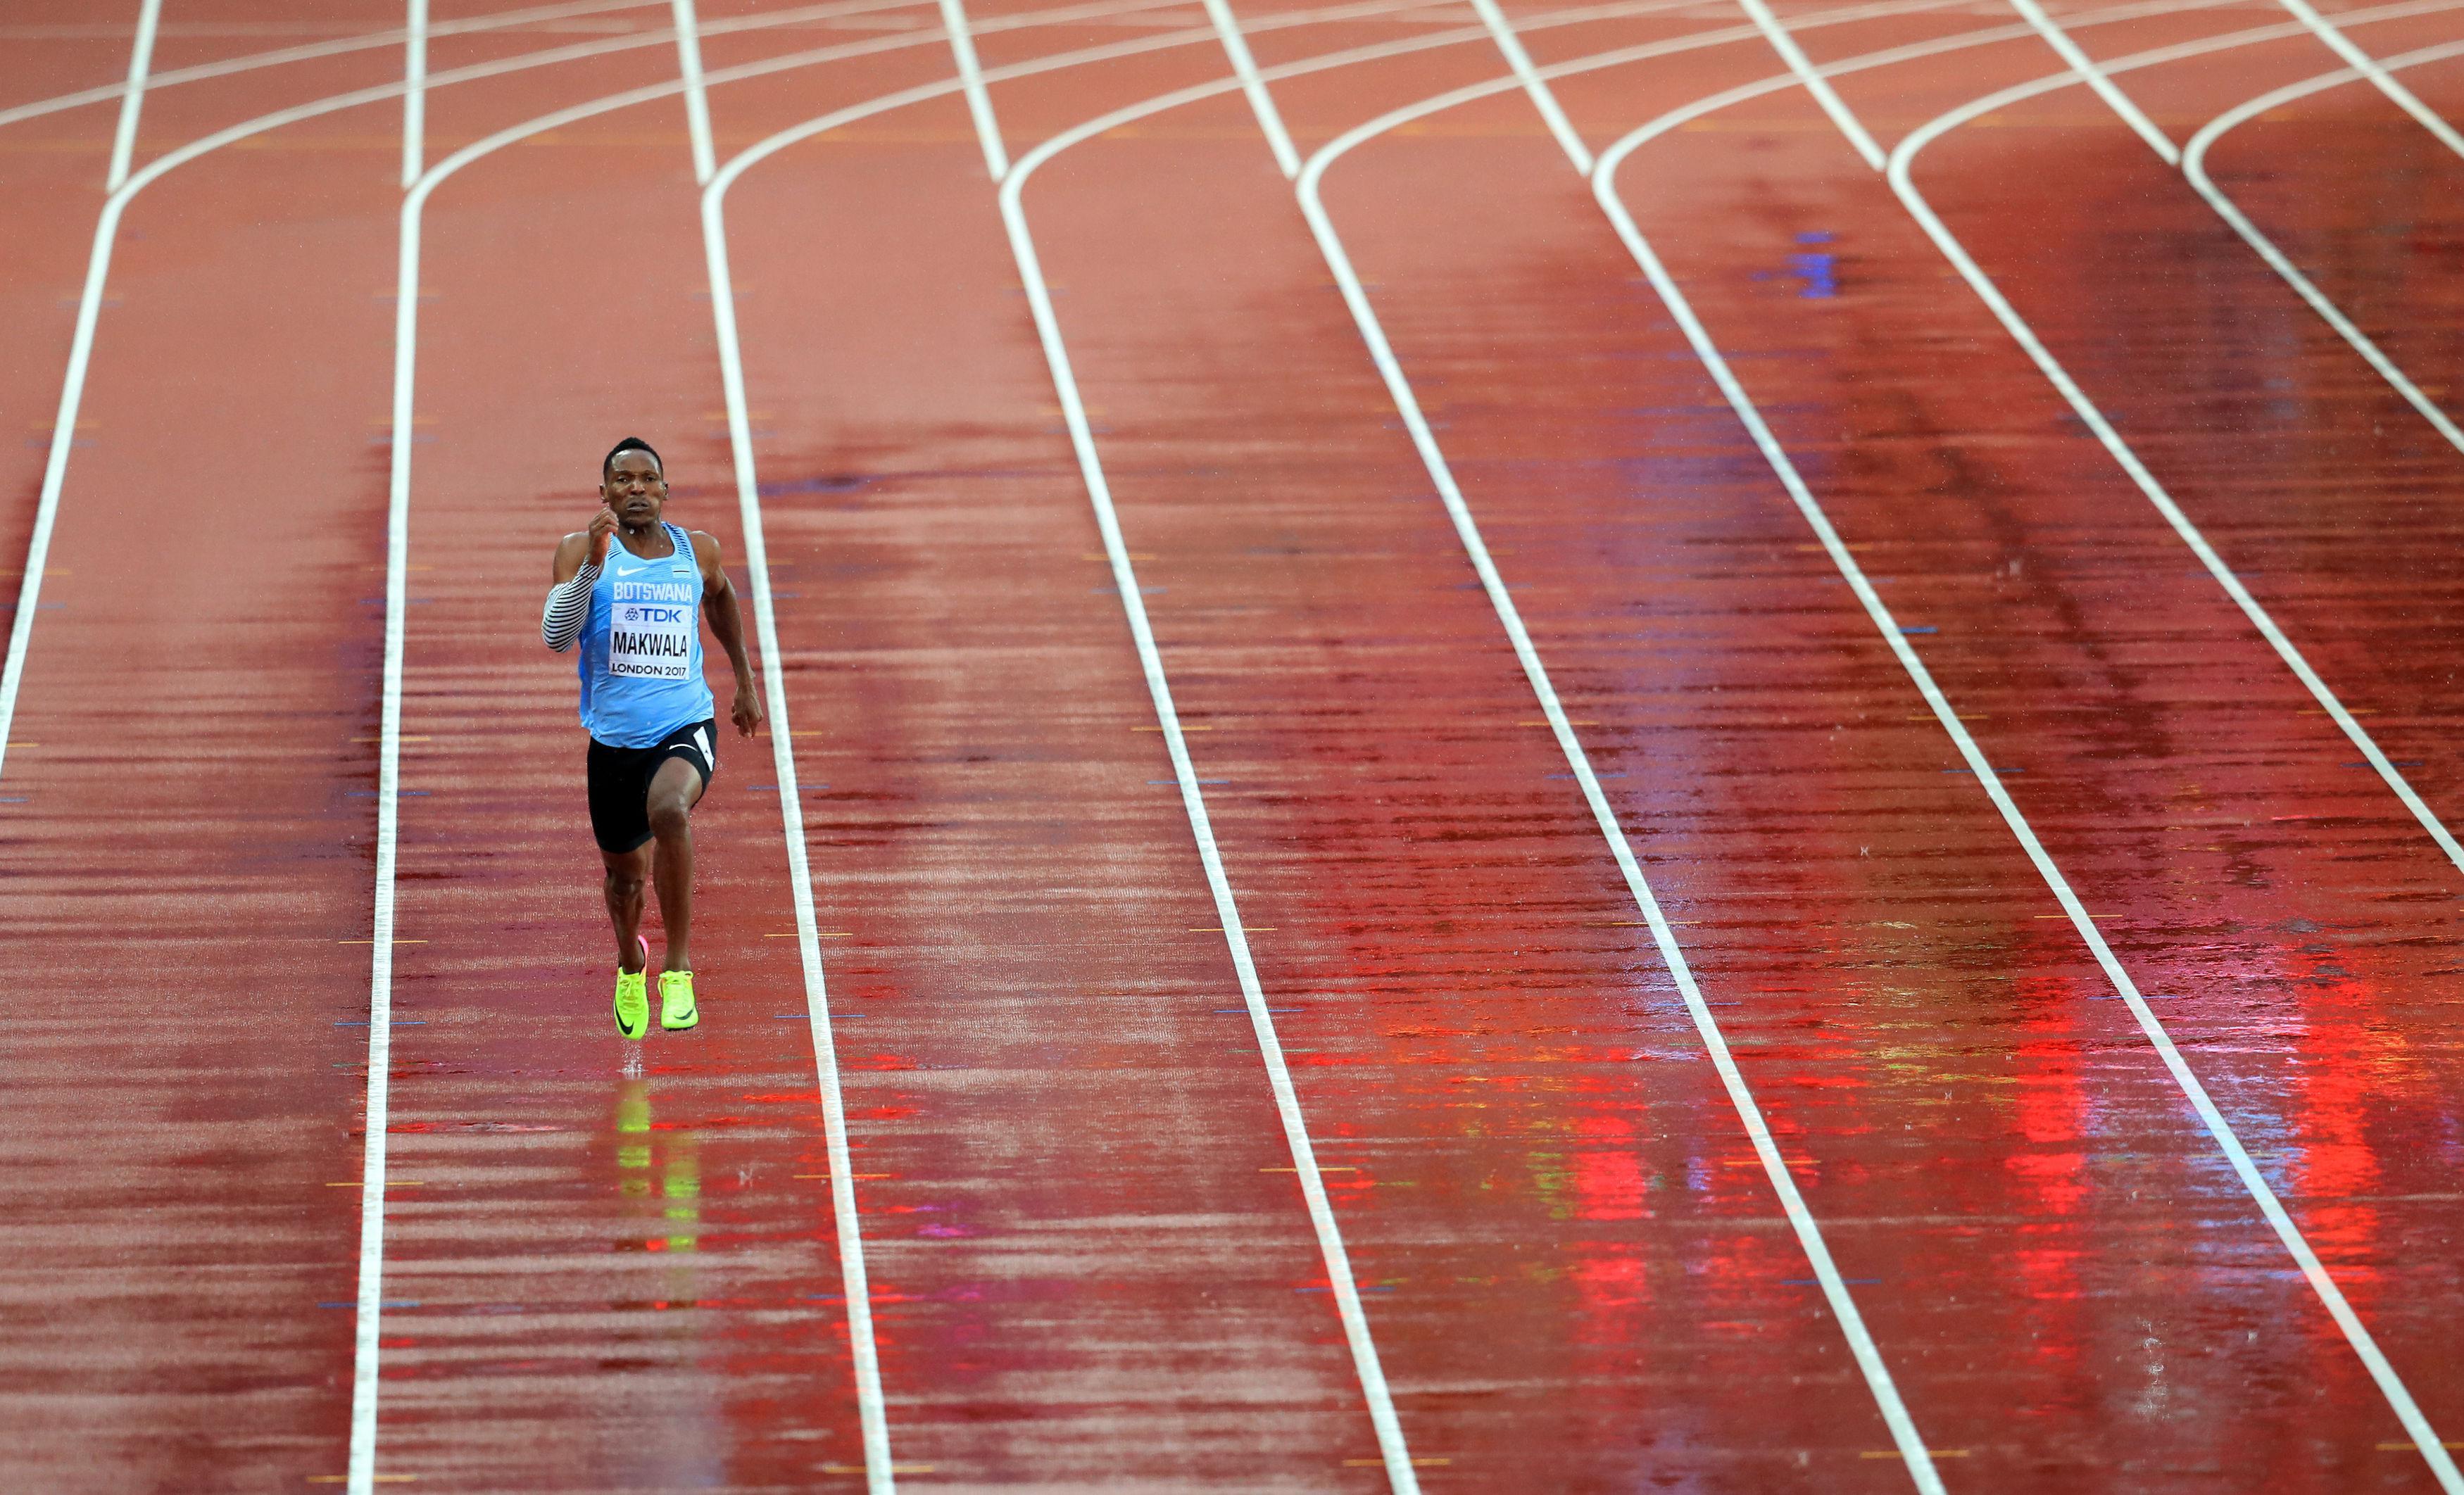 The spectators inside the London Stadium tonight where witness to Isaac Makwala running alone in the 200m